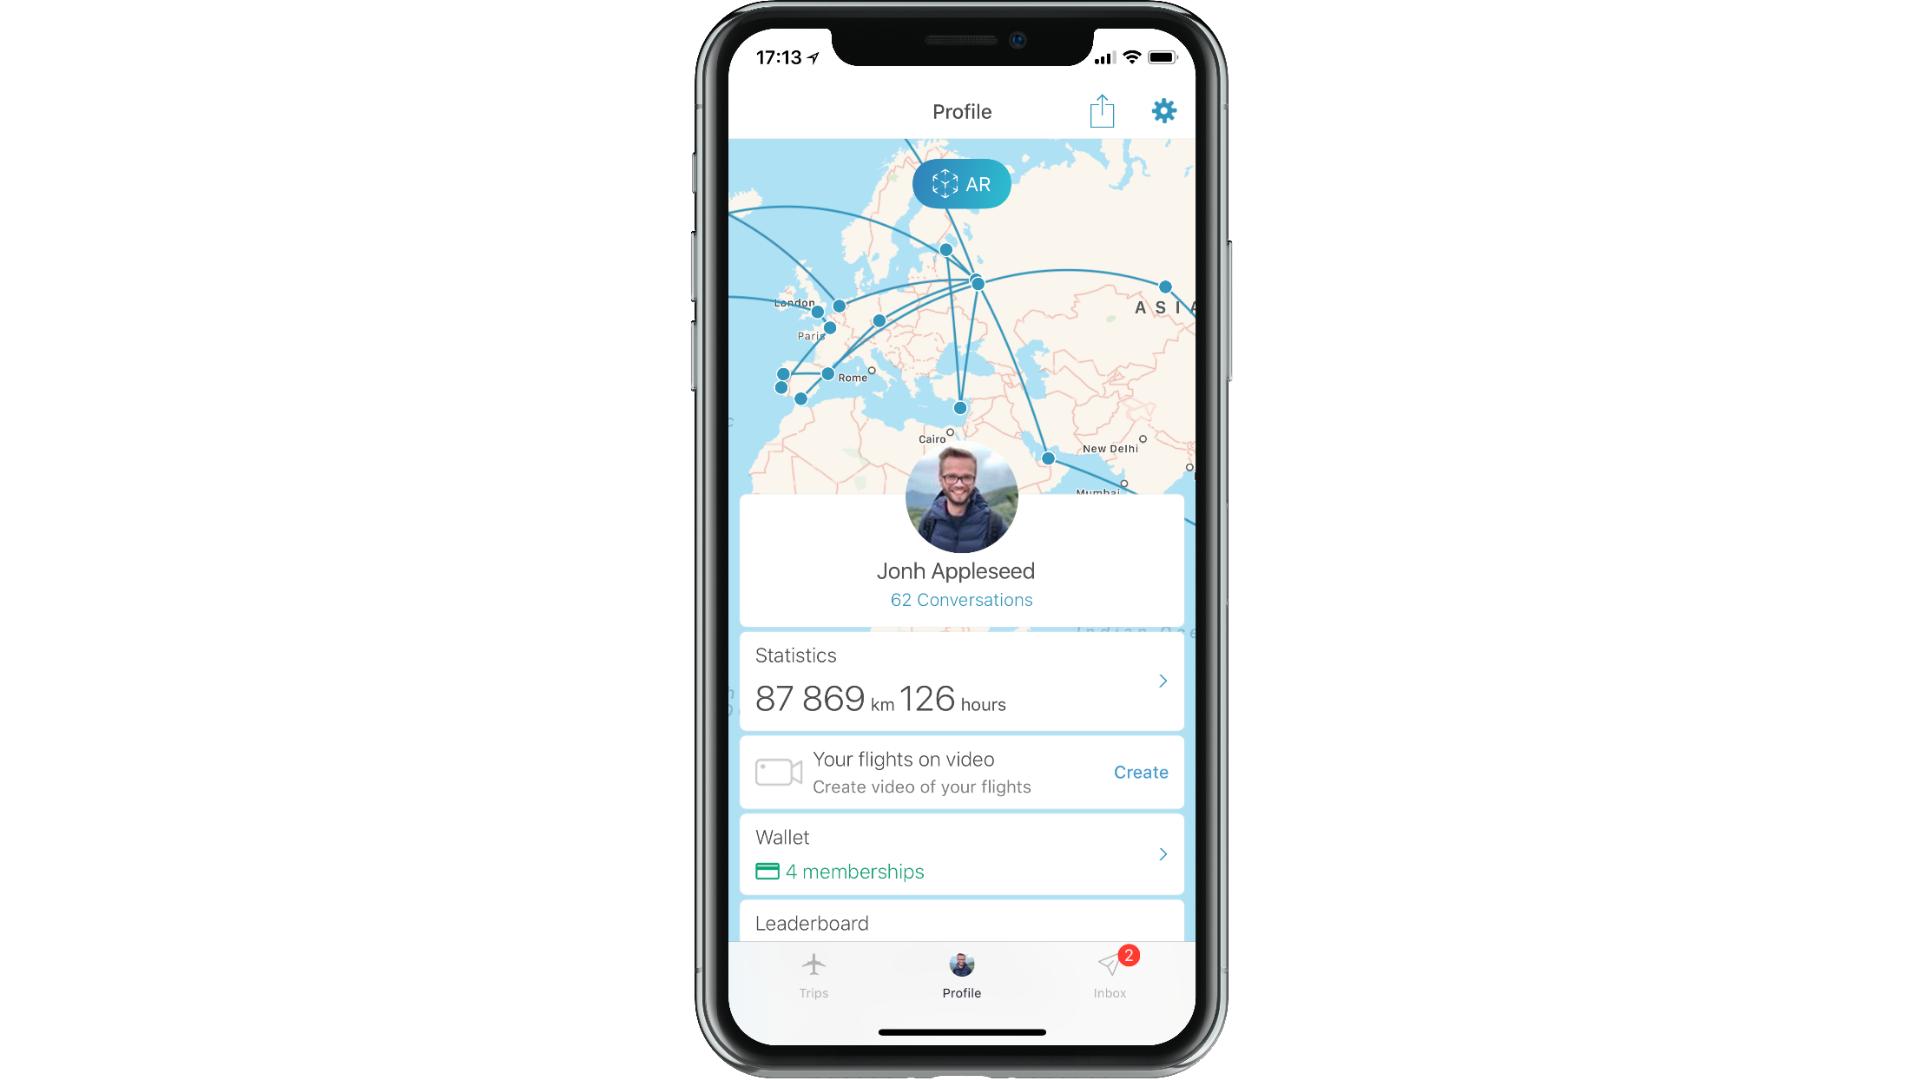 Как реализуется Retentioneering в App in the Air